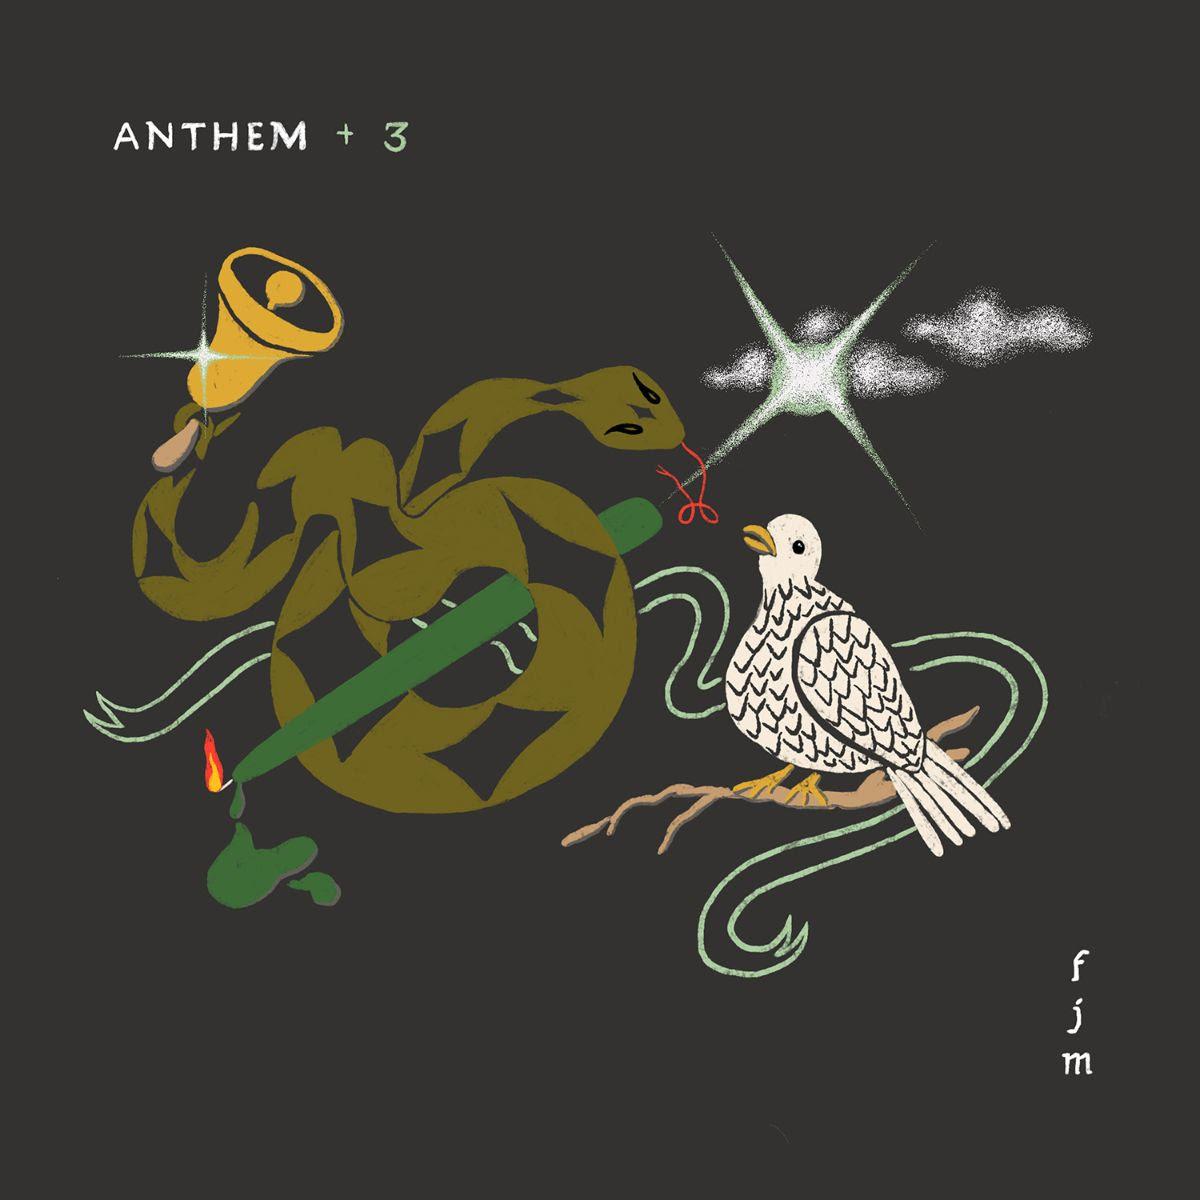 father john misty anthem +3 covers benefit ep bandcamp day leonard cohen